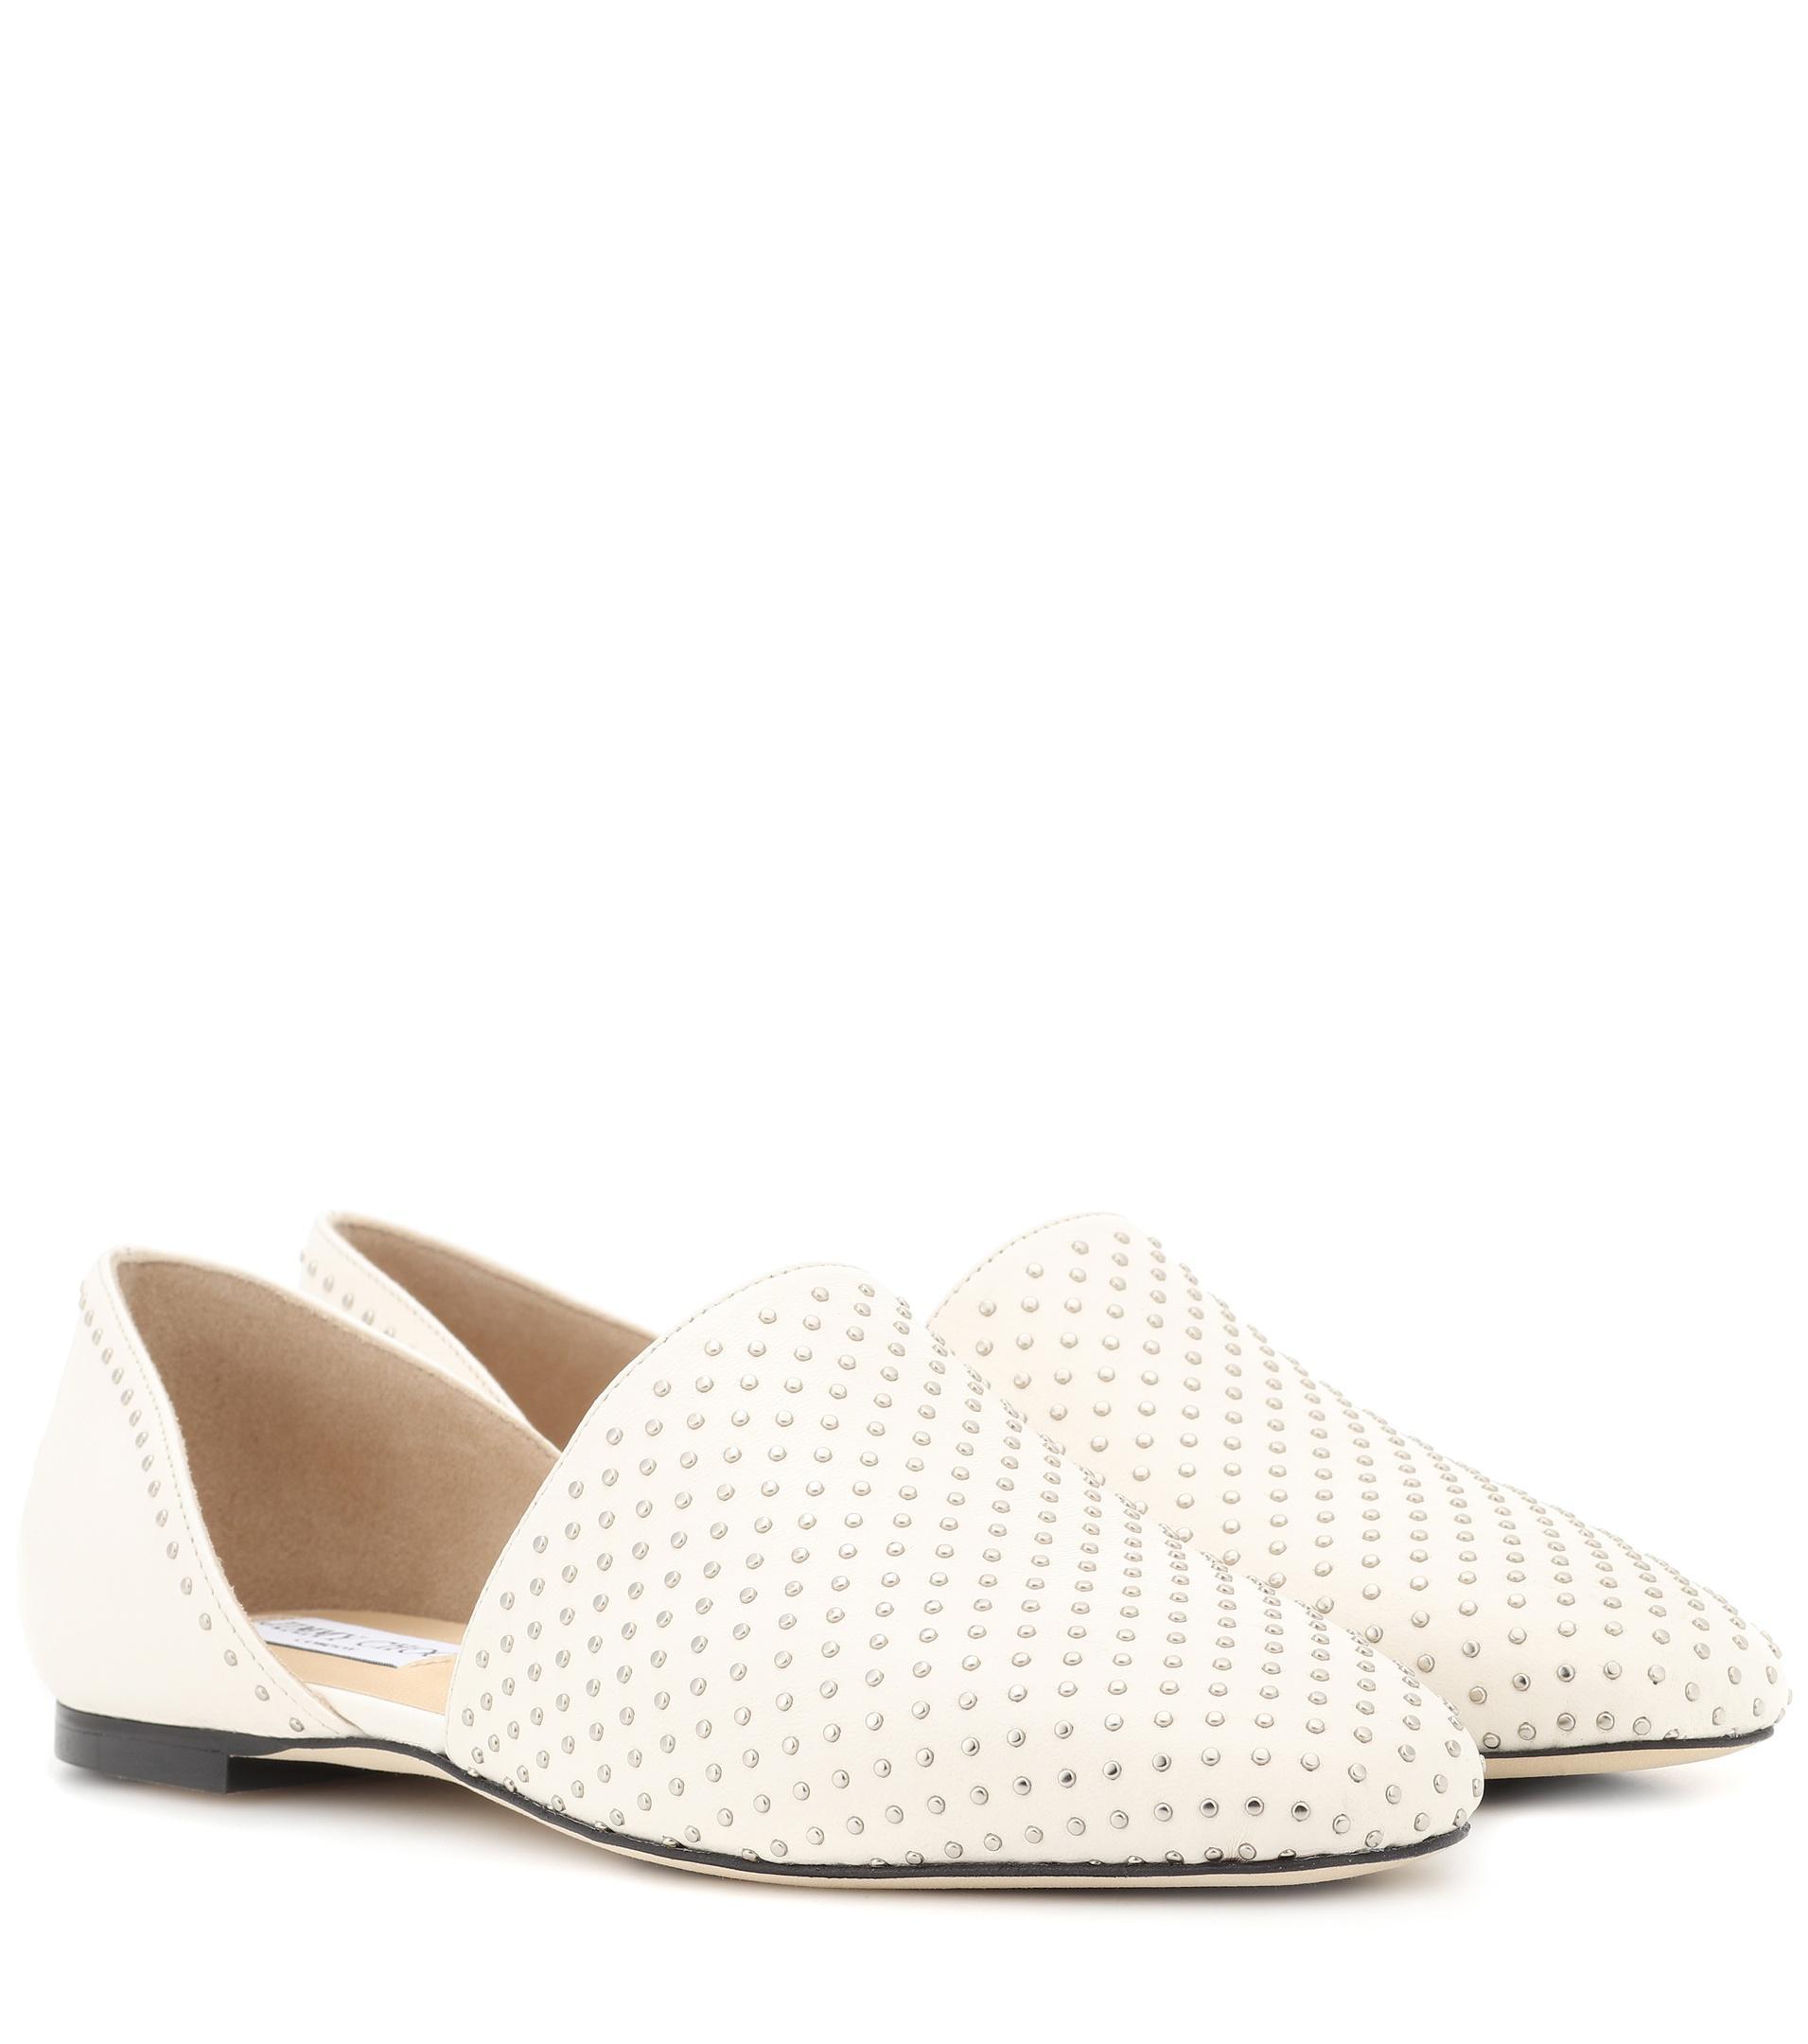 Globe cutout loafers - White Jimmy Choo London WppCFy